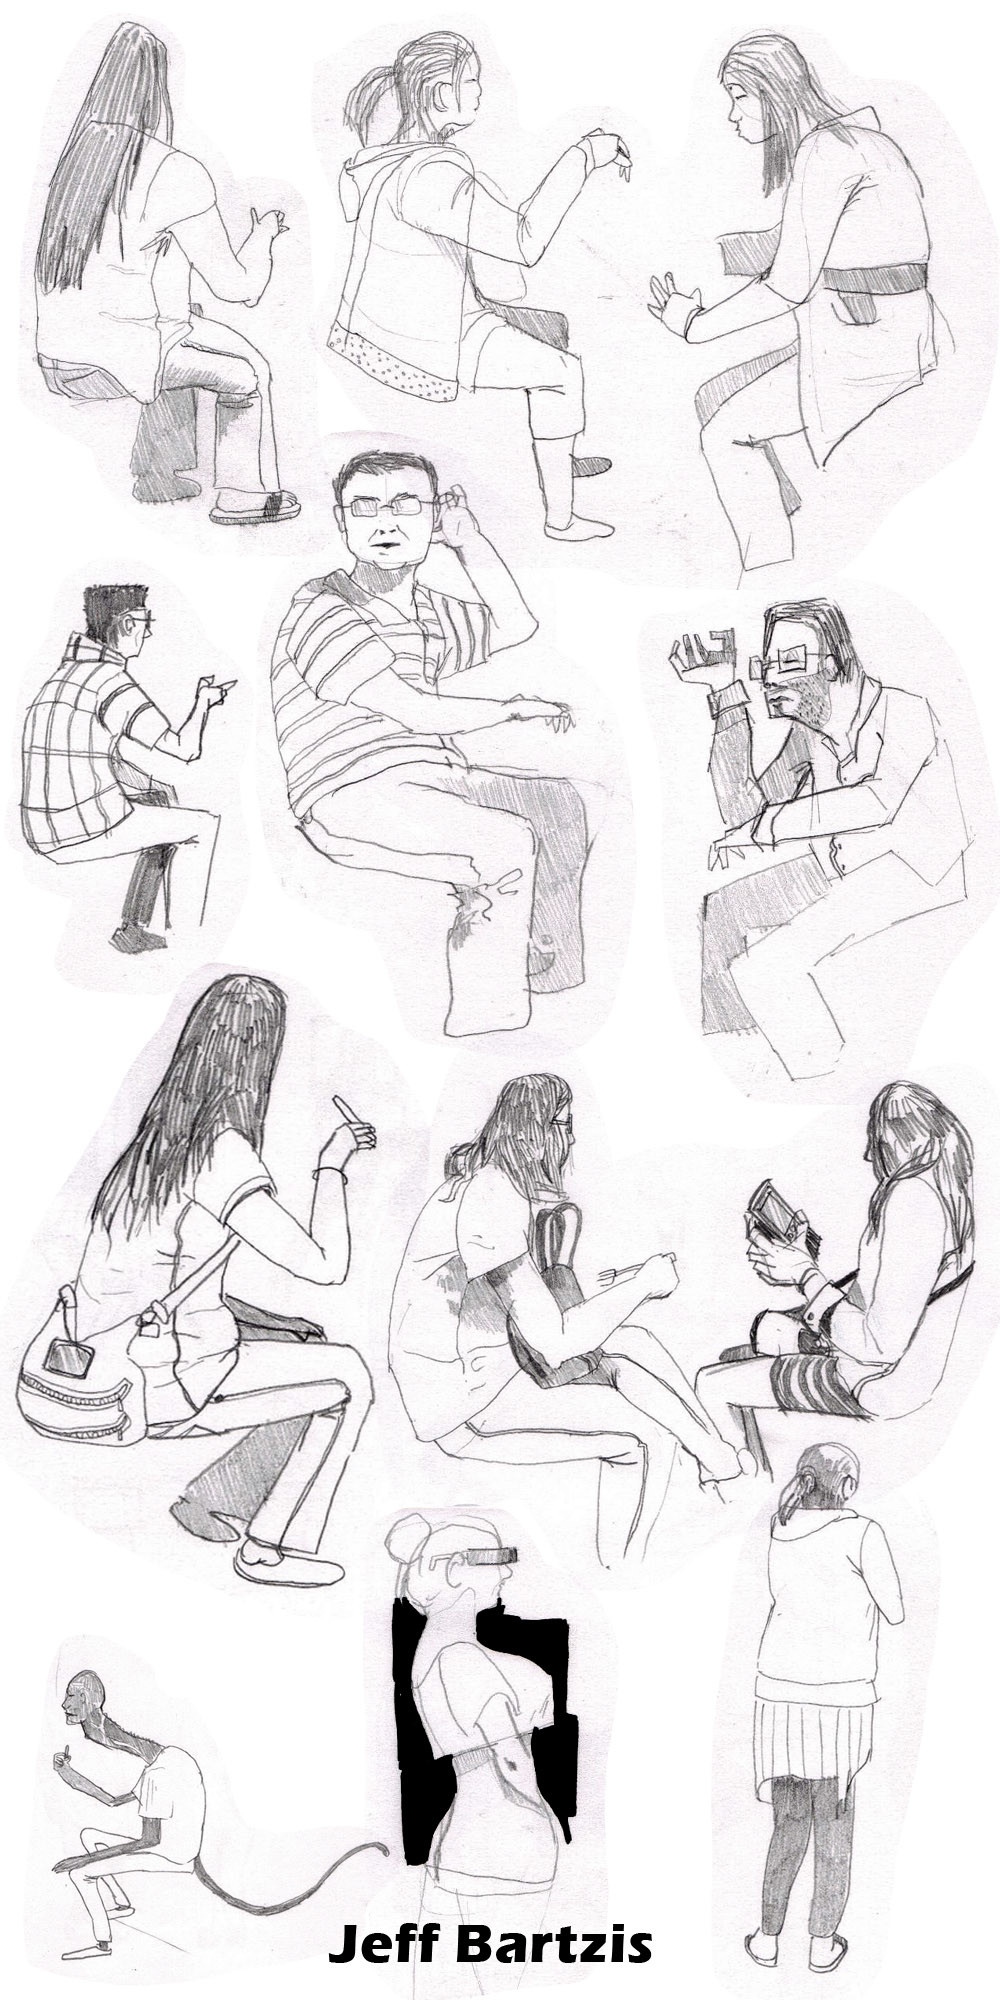 Jeff bartzis sketchbook stuff 036